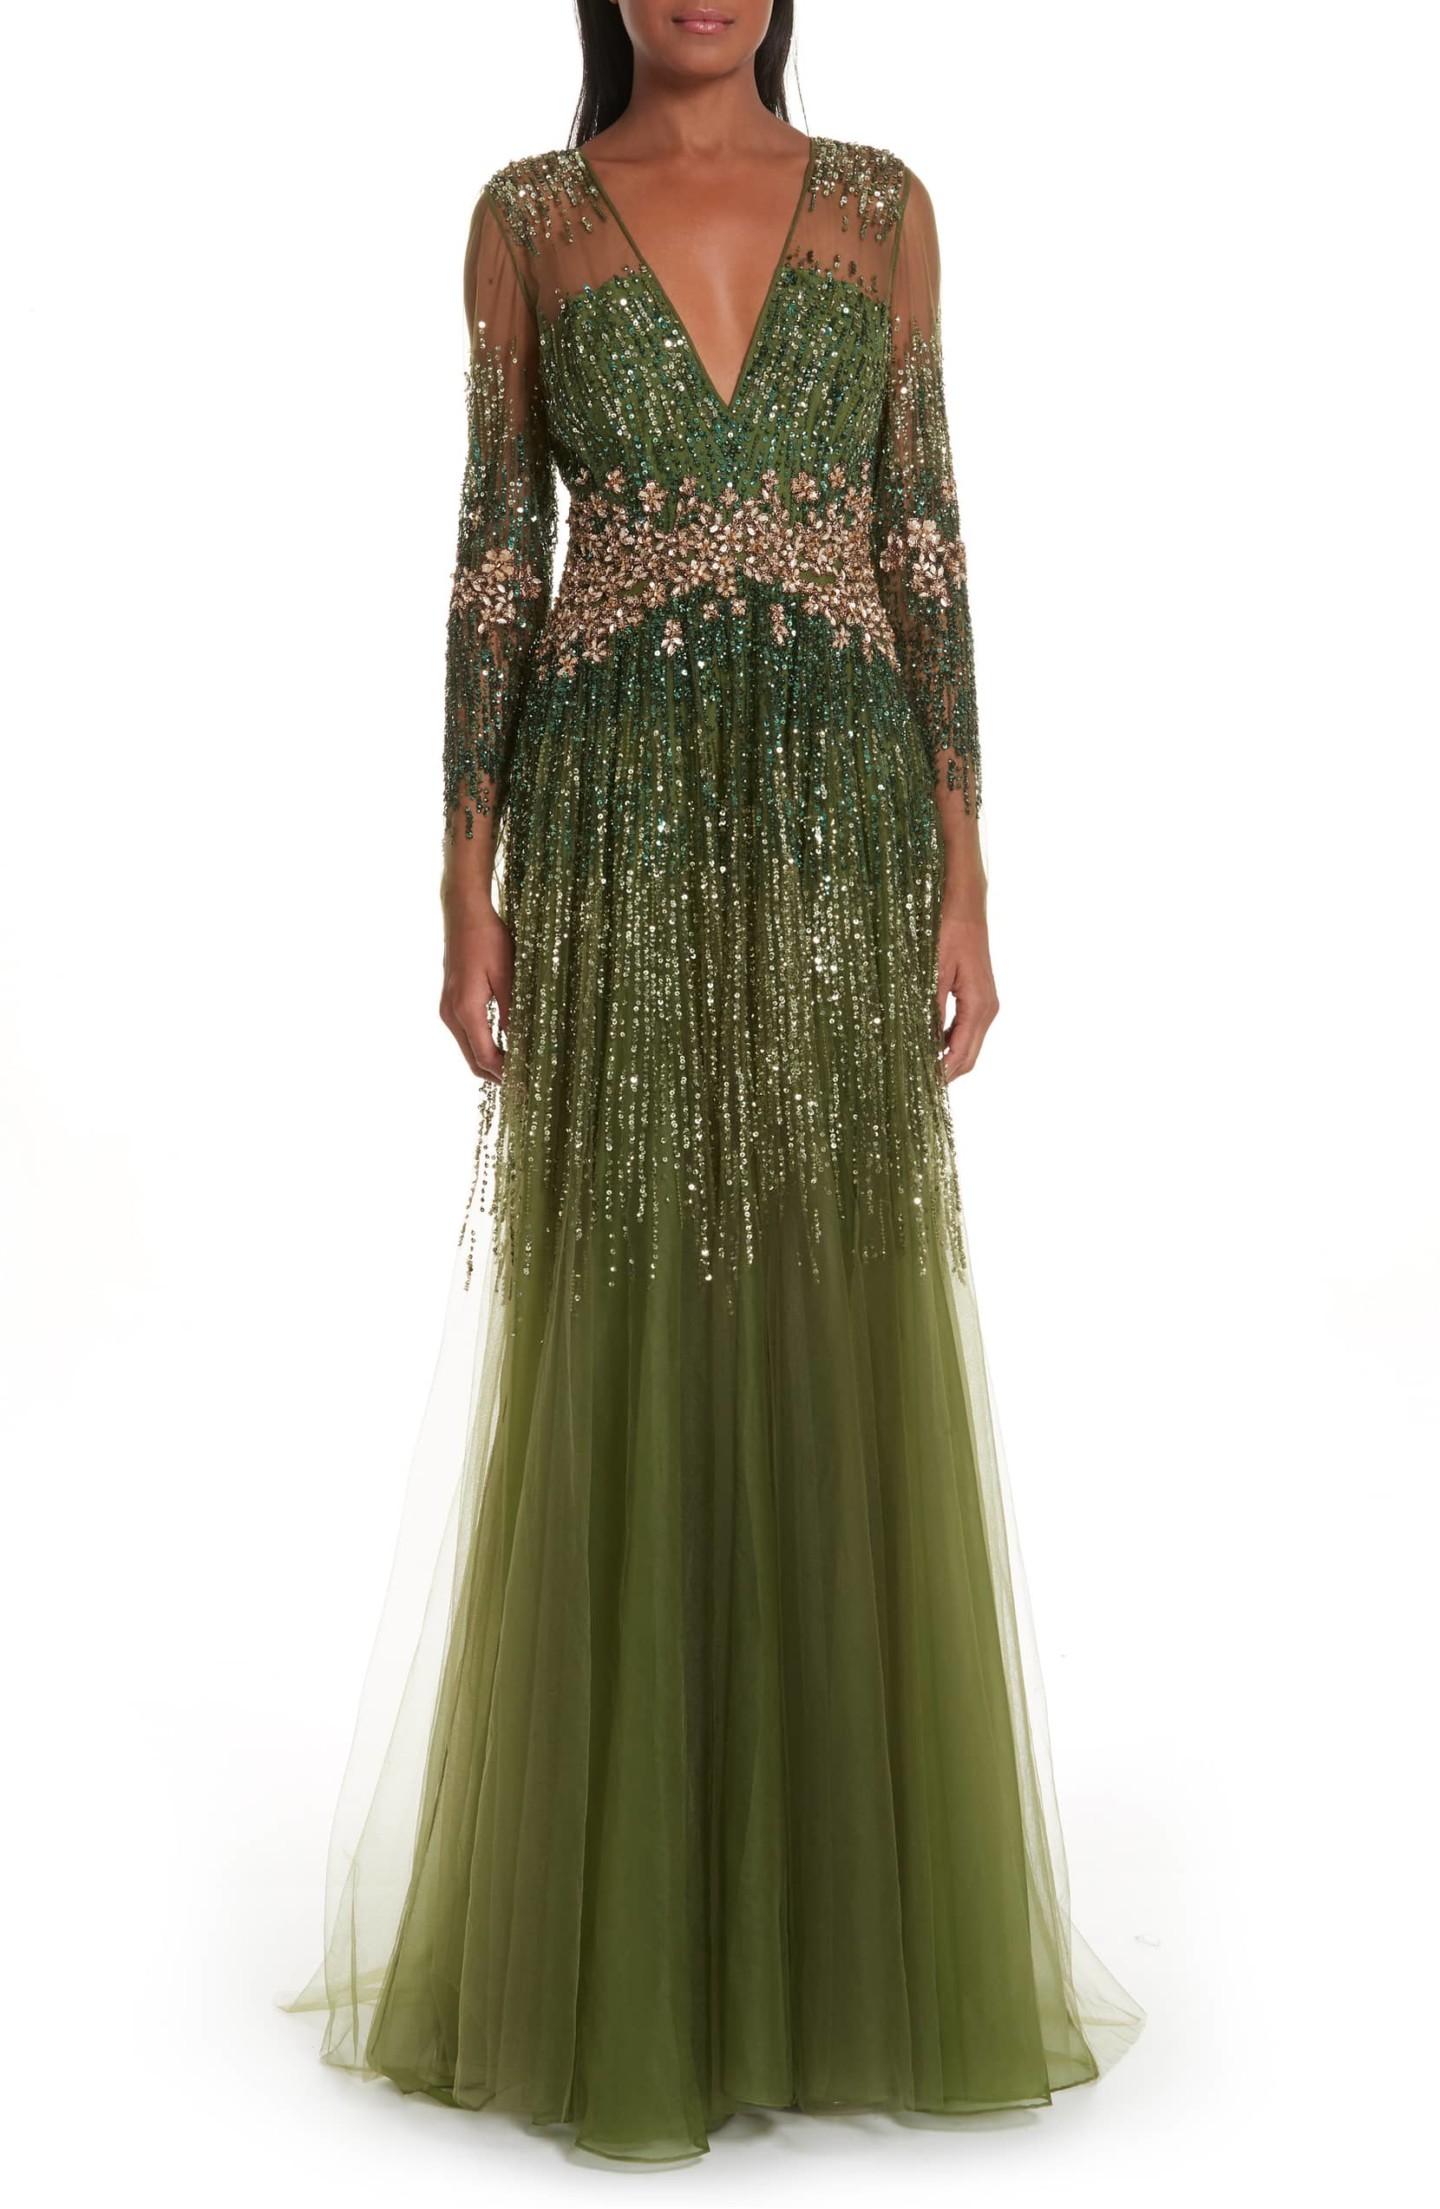 PAMELLA ROLAND Crystal Embellished A-Line Green Gown